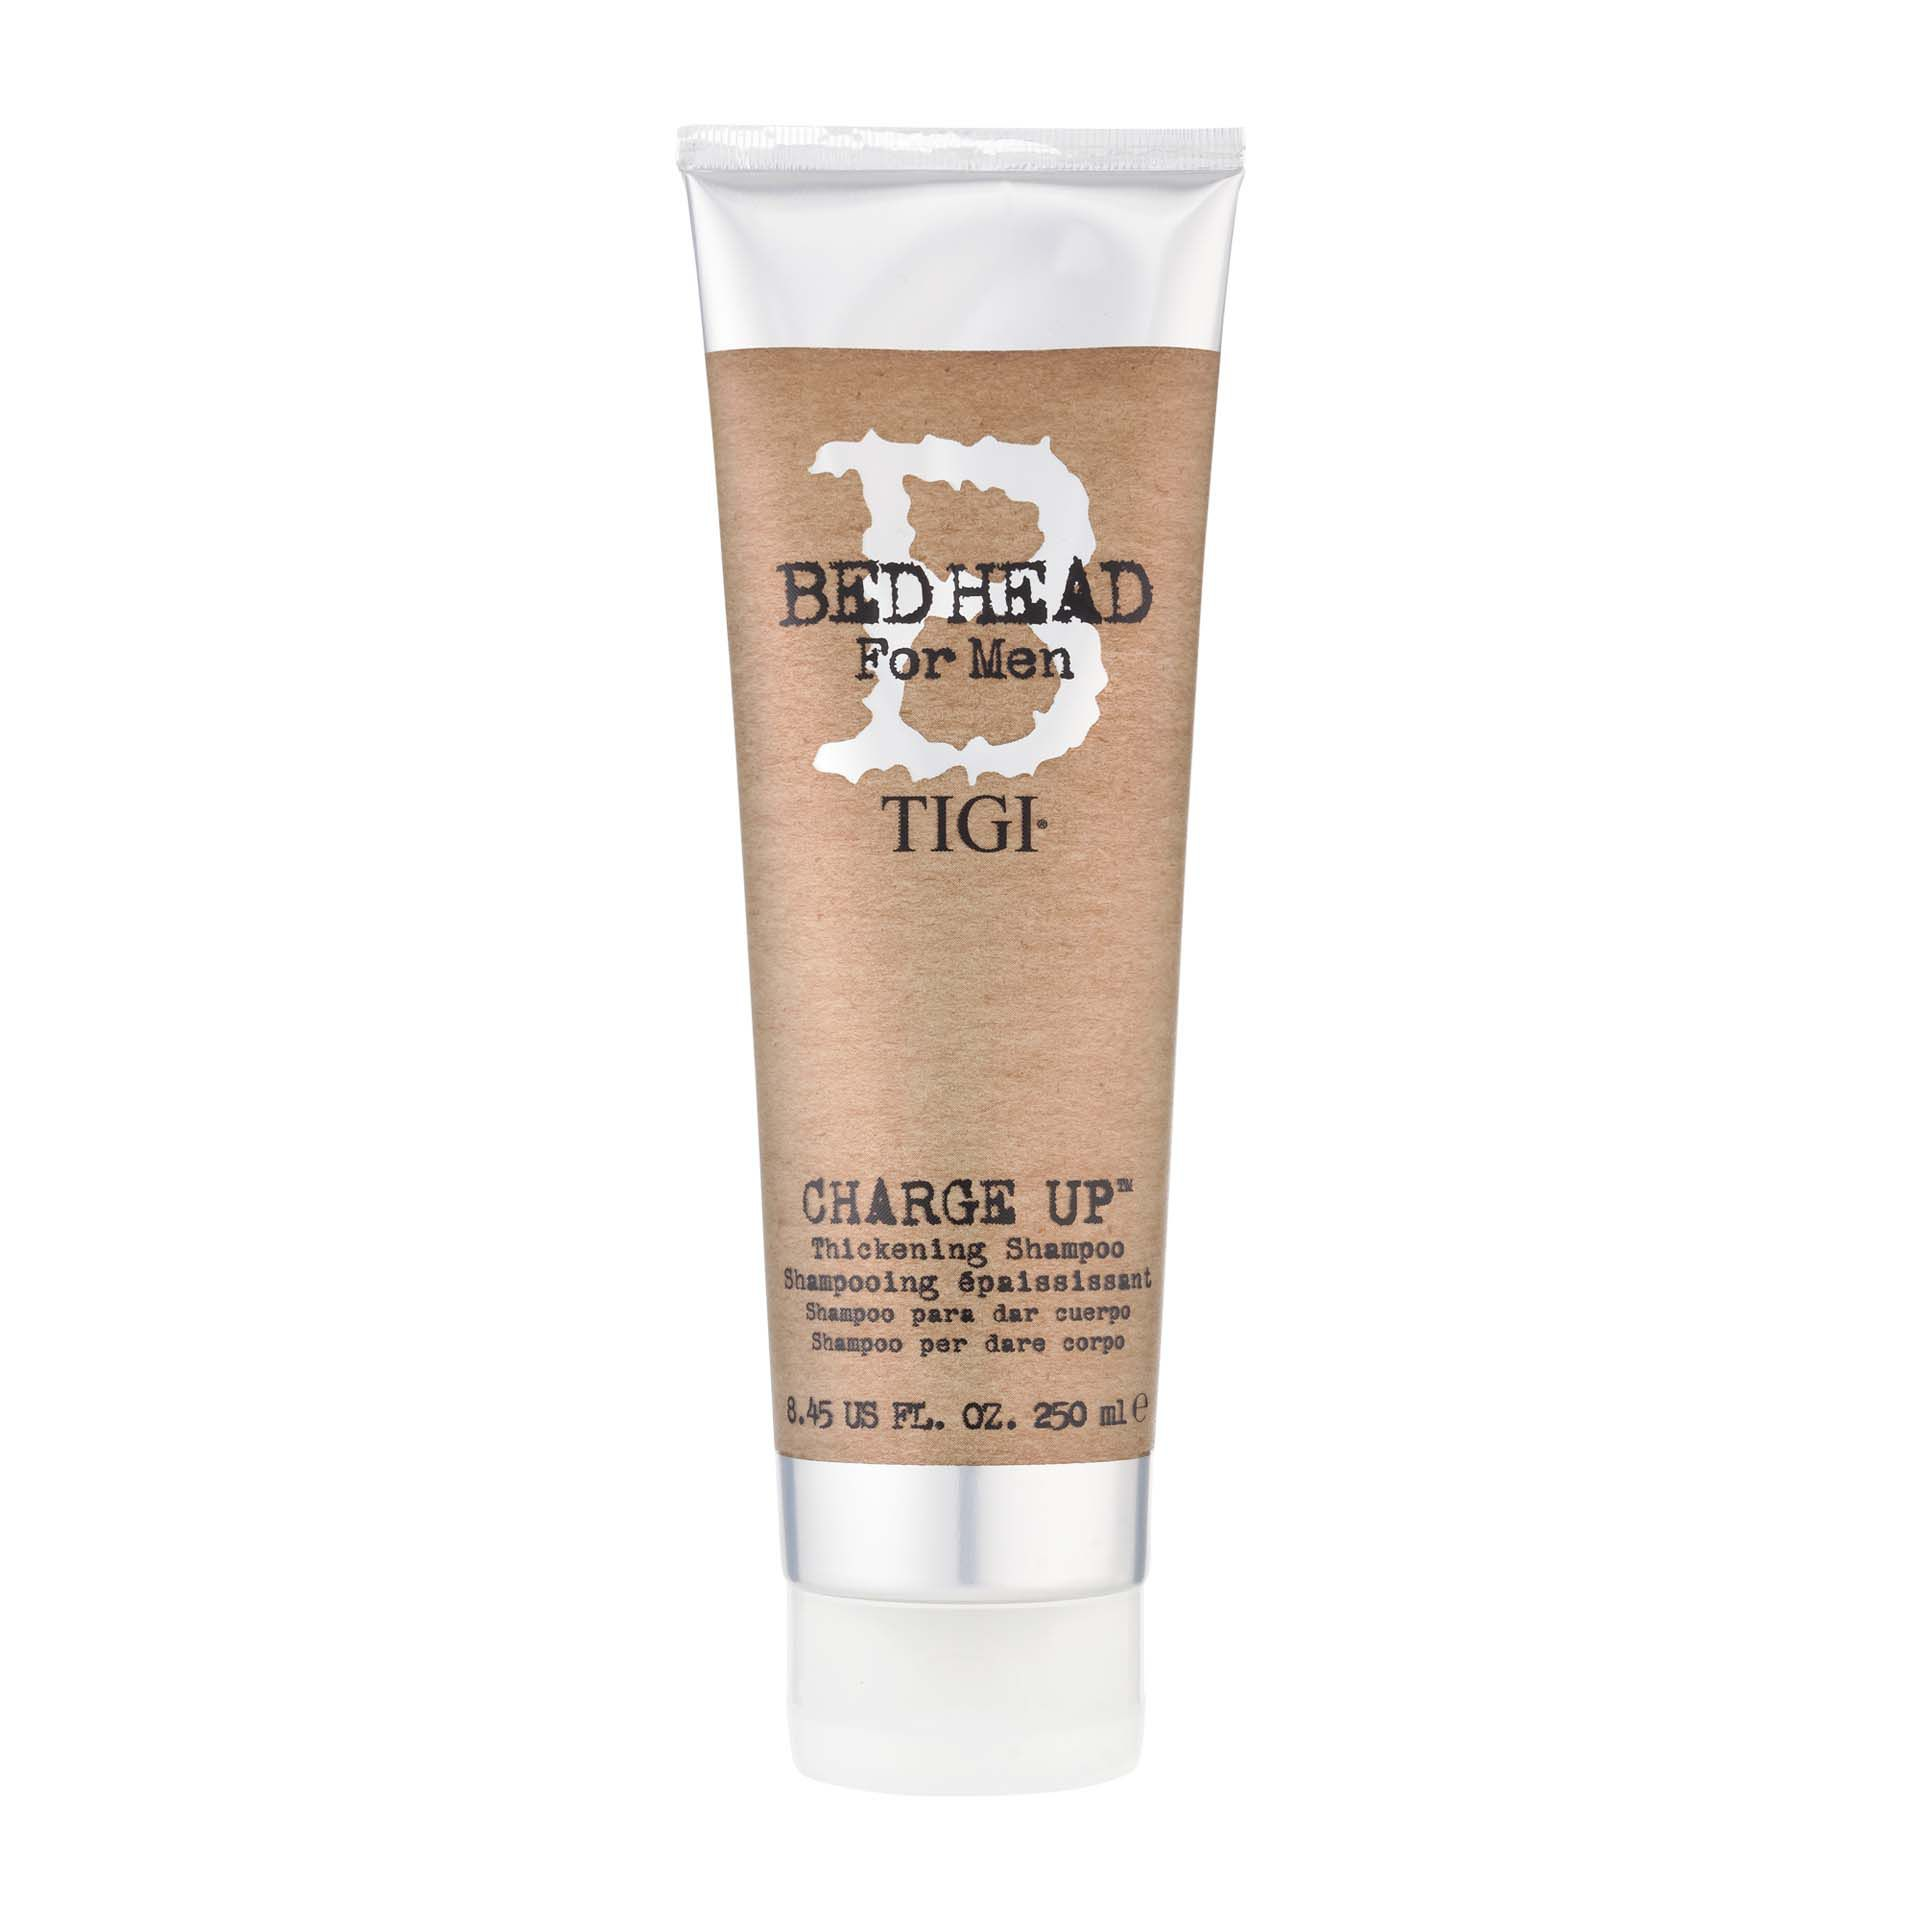 tigi bed head for men charge up shampoo